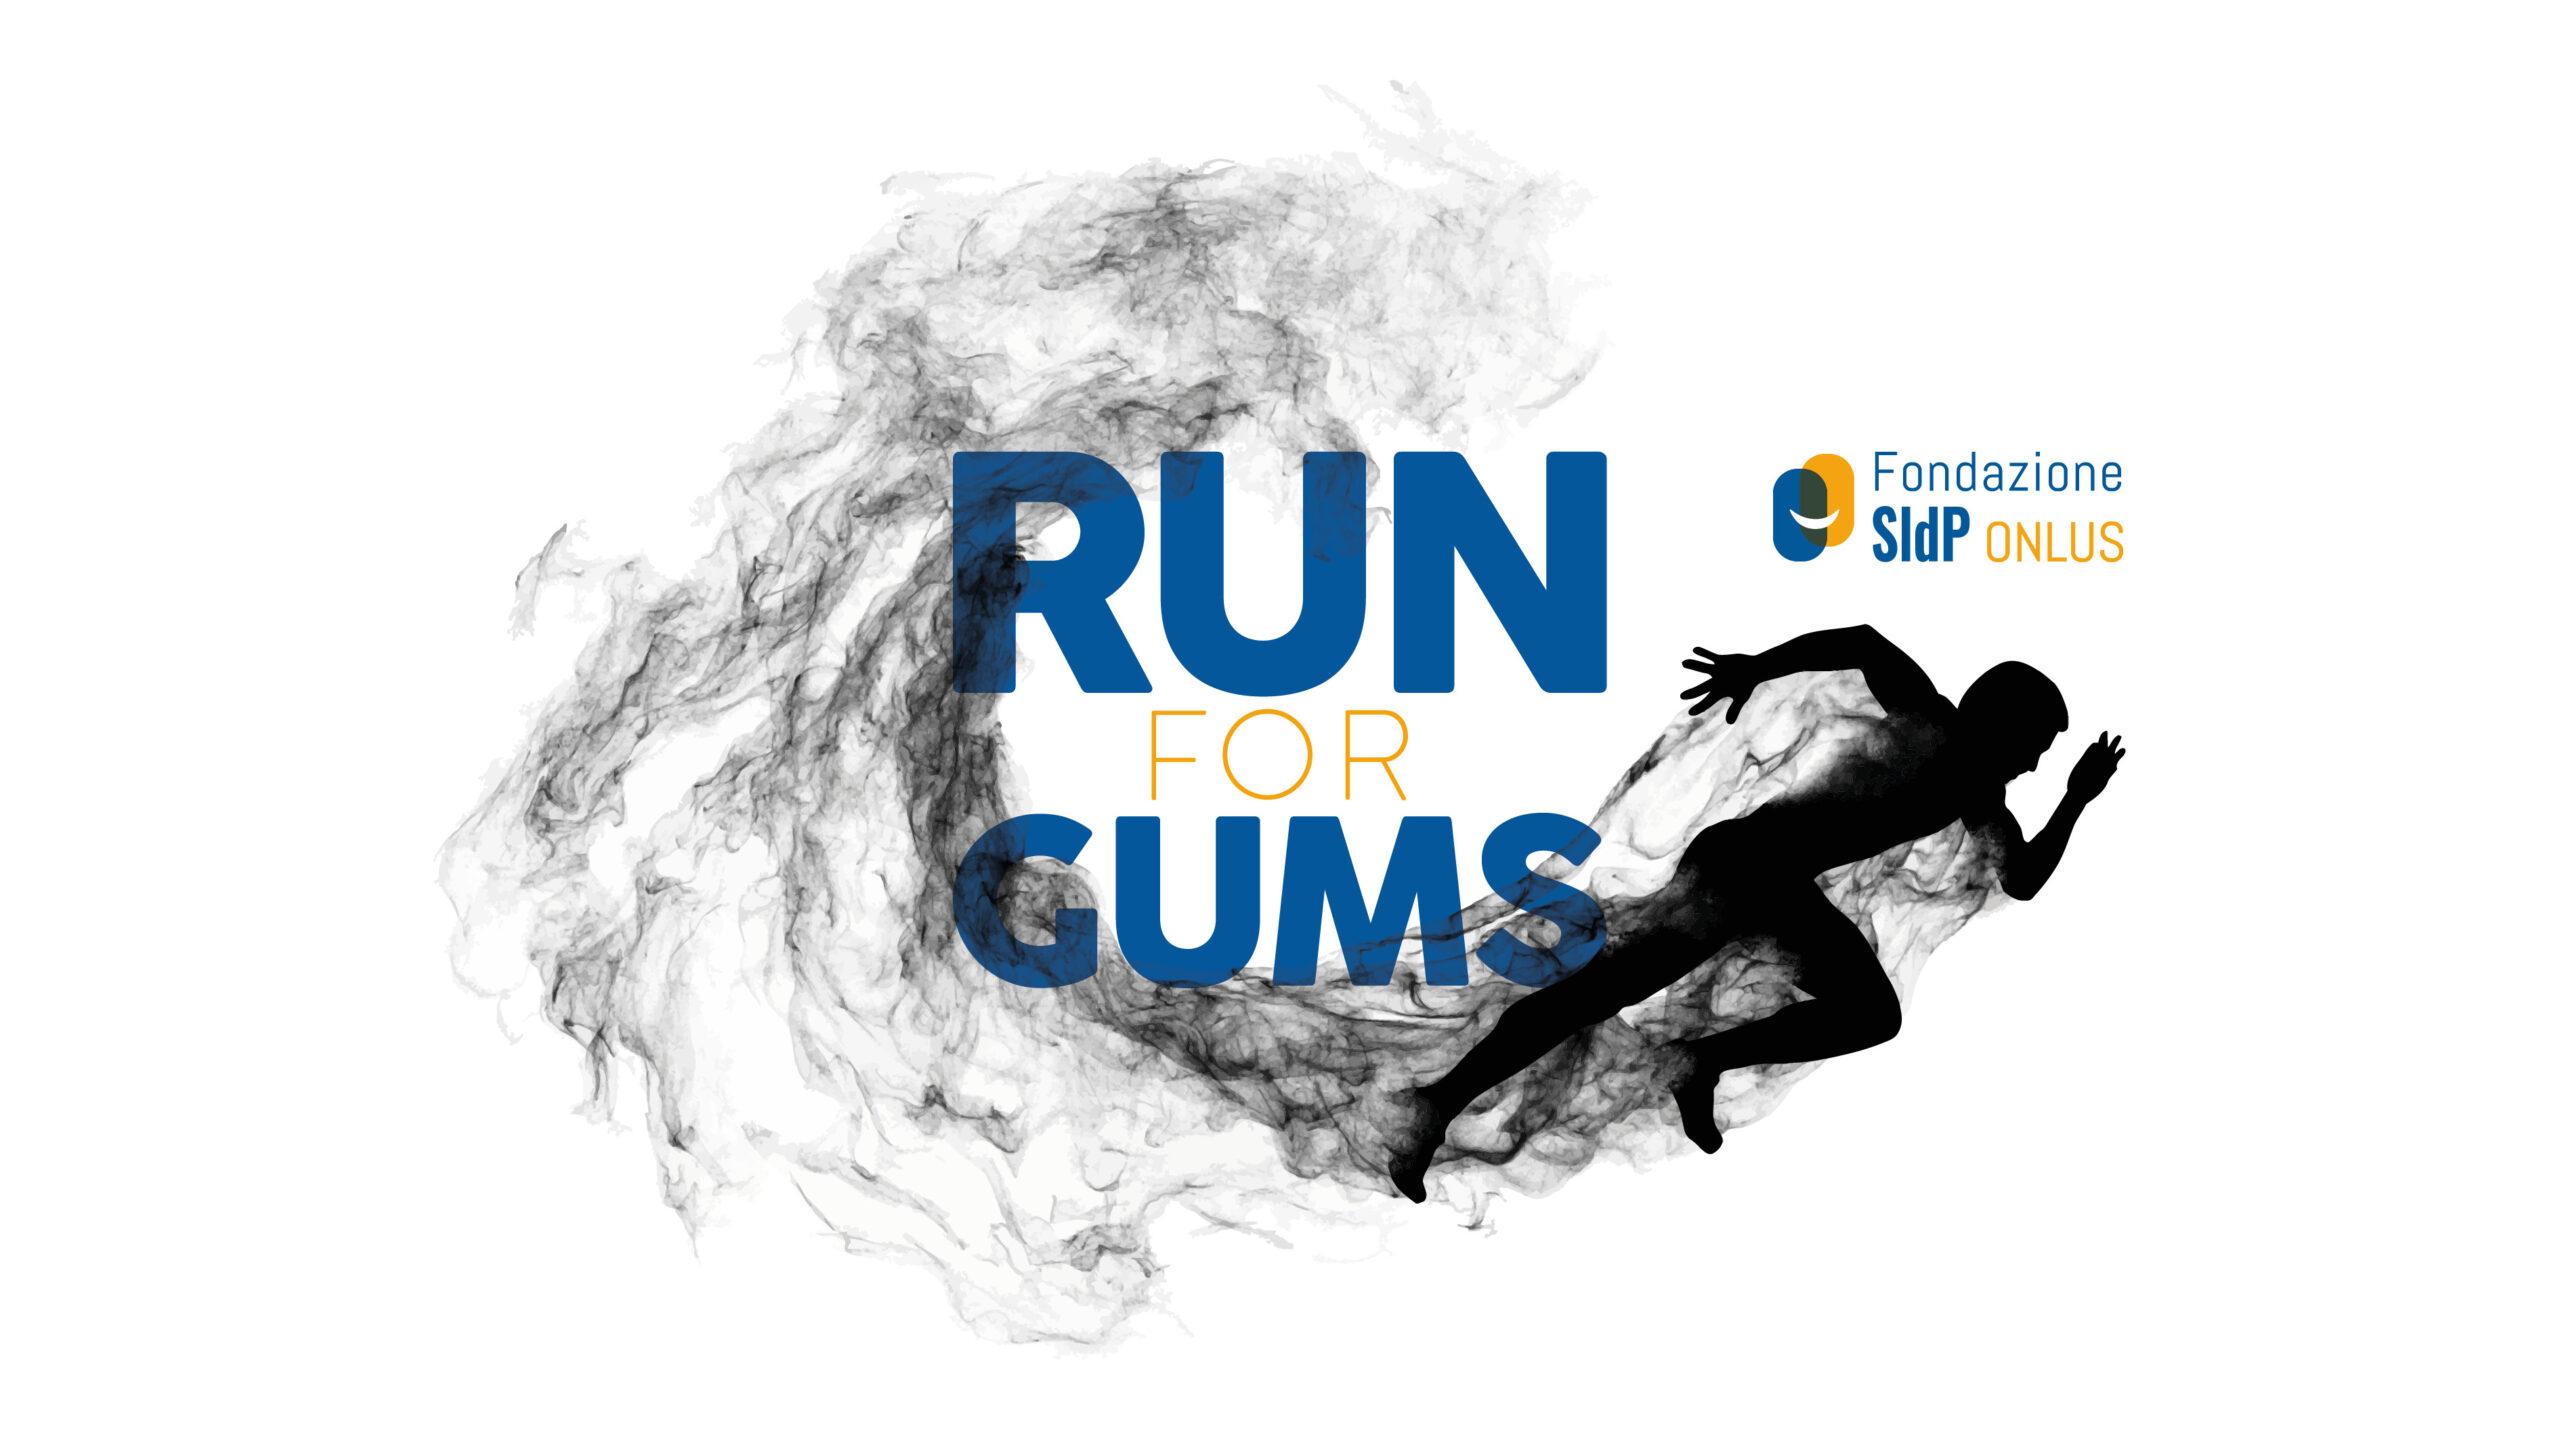 Run For Gums Fondazione SIdP Onlus